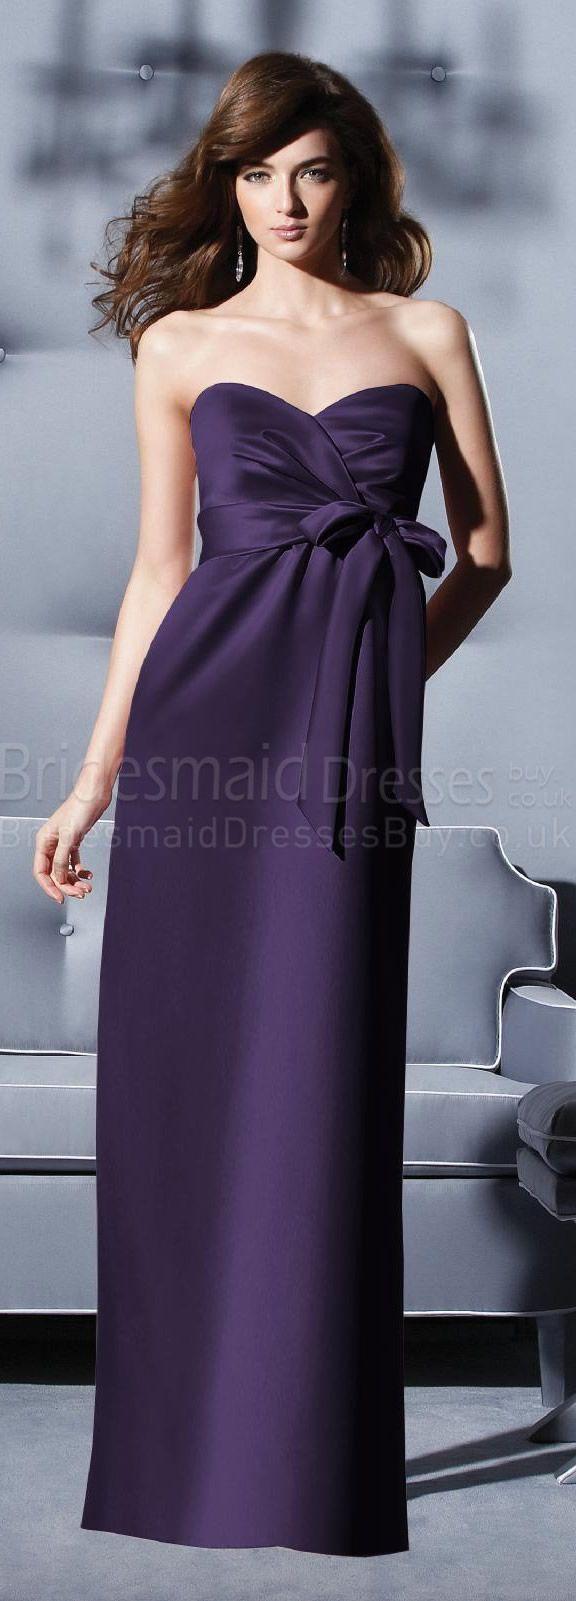 purple bridesmaid dress,Long Bridesmaid Dresses bridesmaiddressesbuy.co.uk